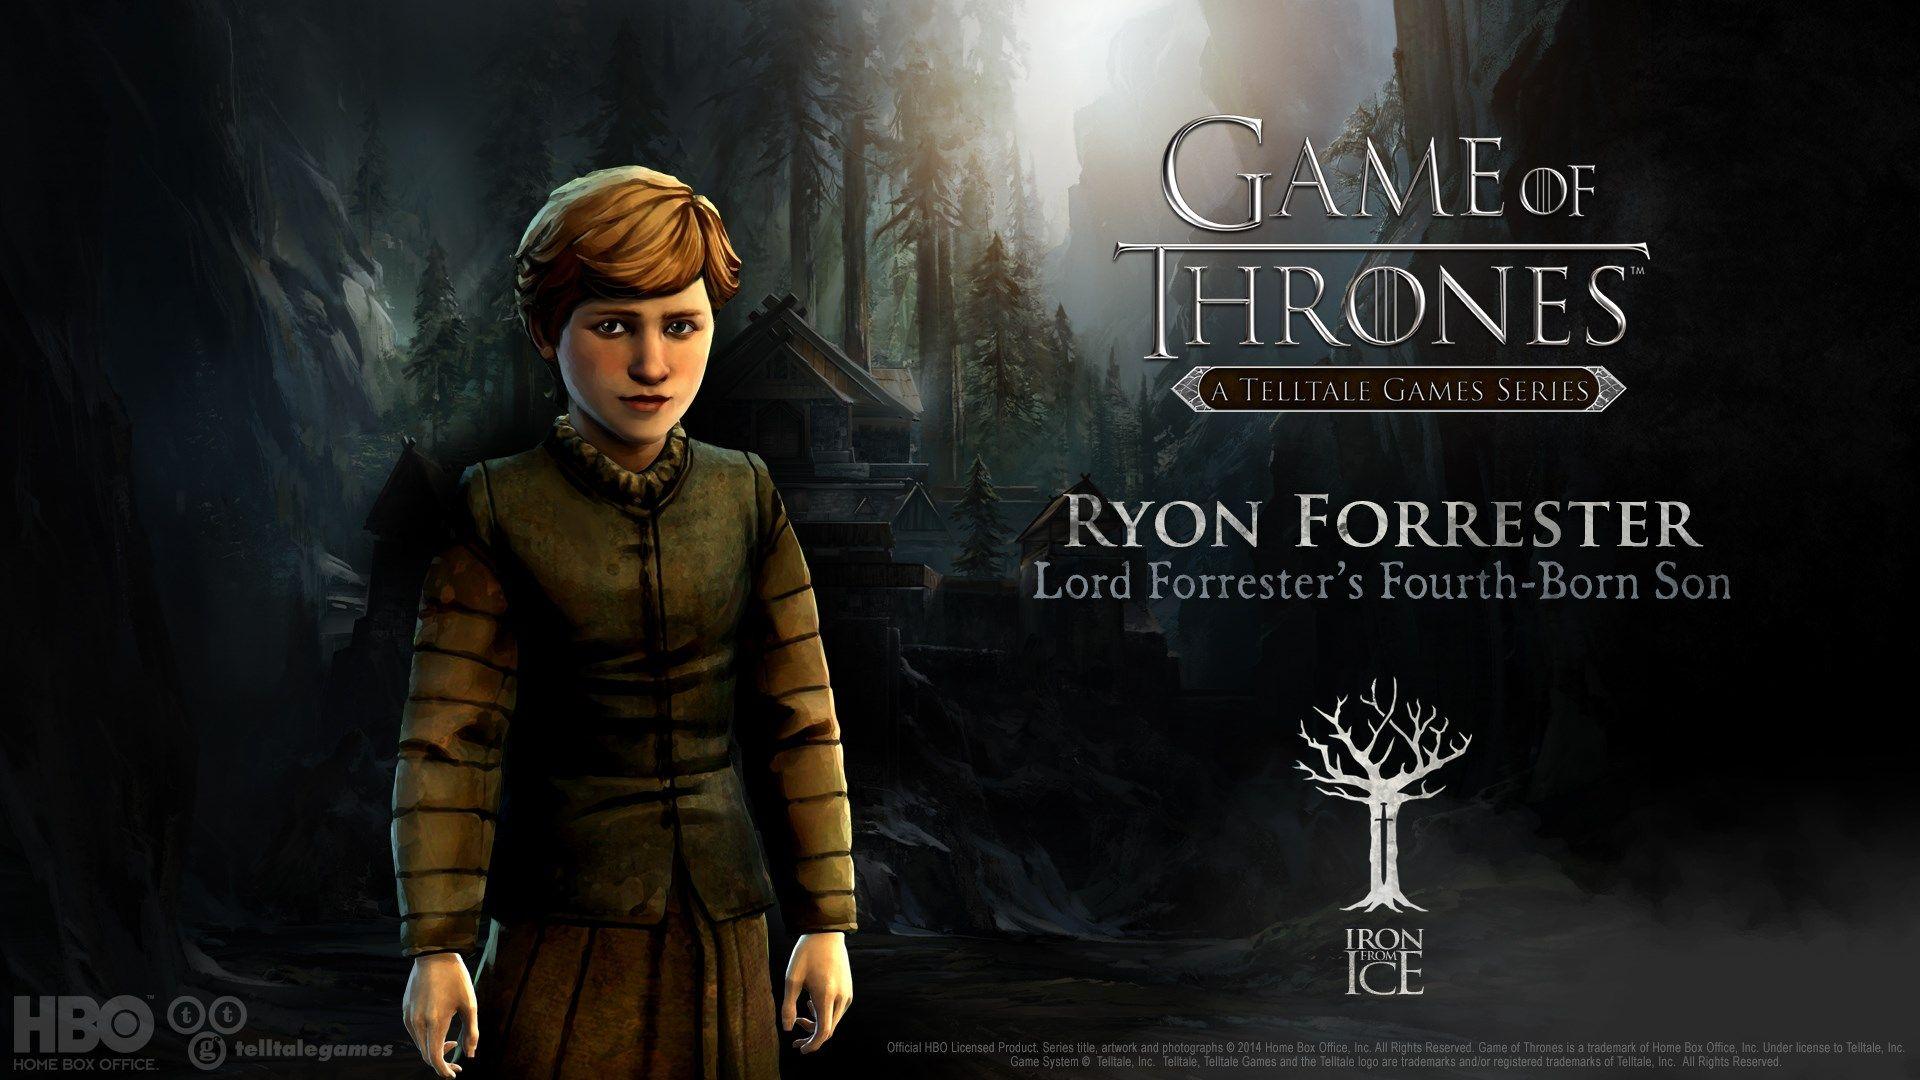 1920x1080 Free Desktop Game Of Thrones A Telltale Games Series Game Of Thrones Telltale Game Of Thrones Throne